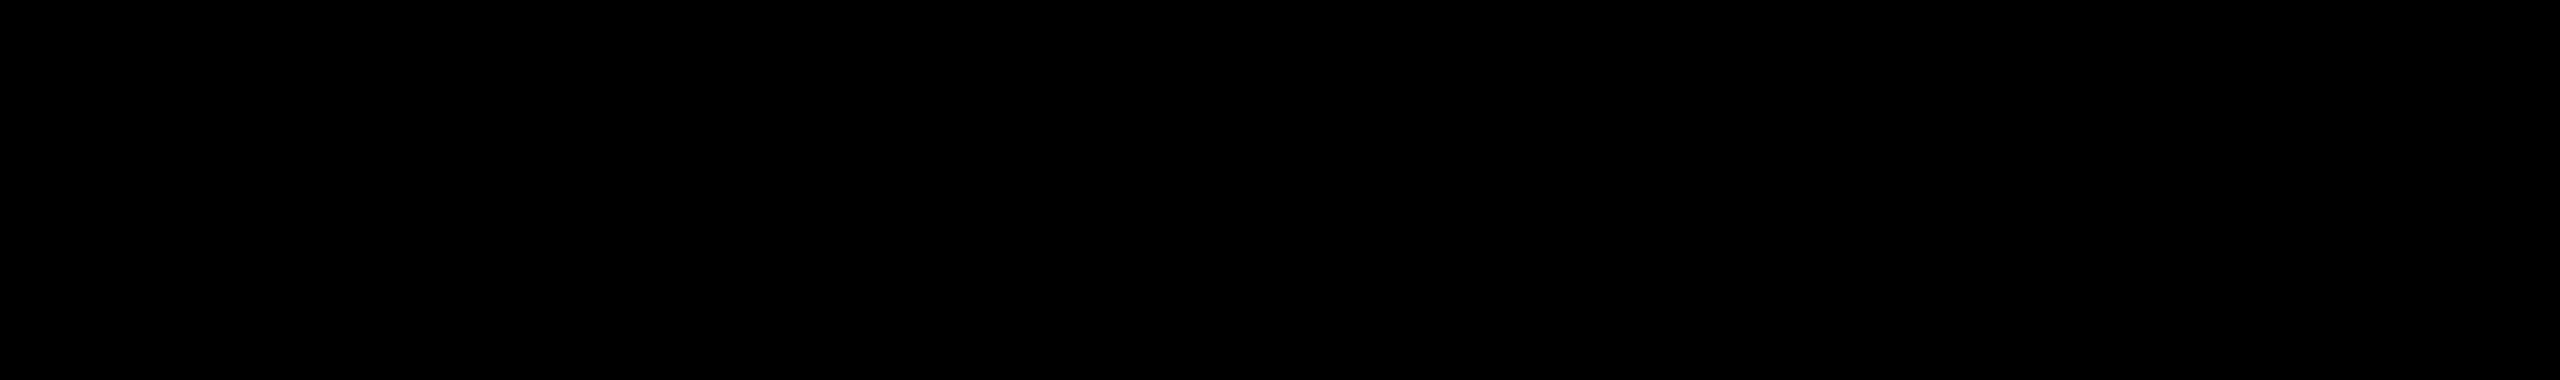 Background Slider BLACK FRIDAY